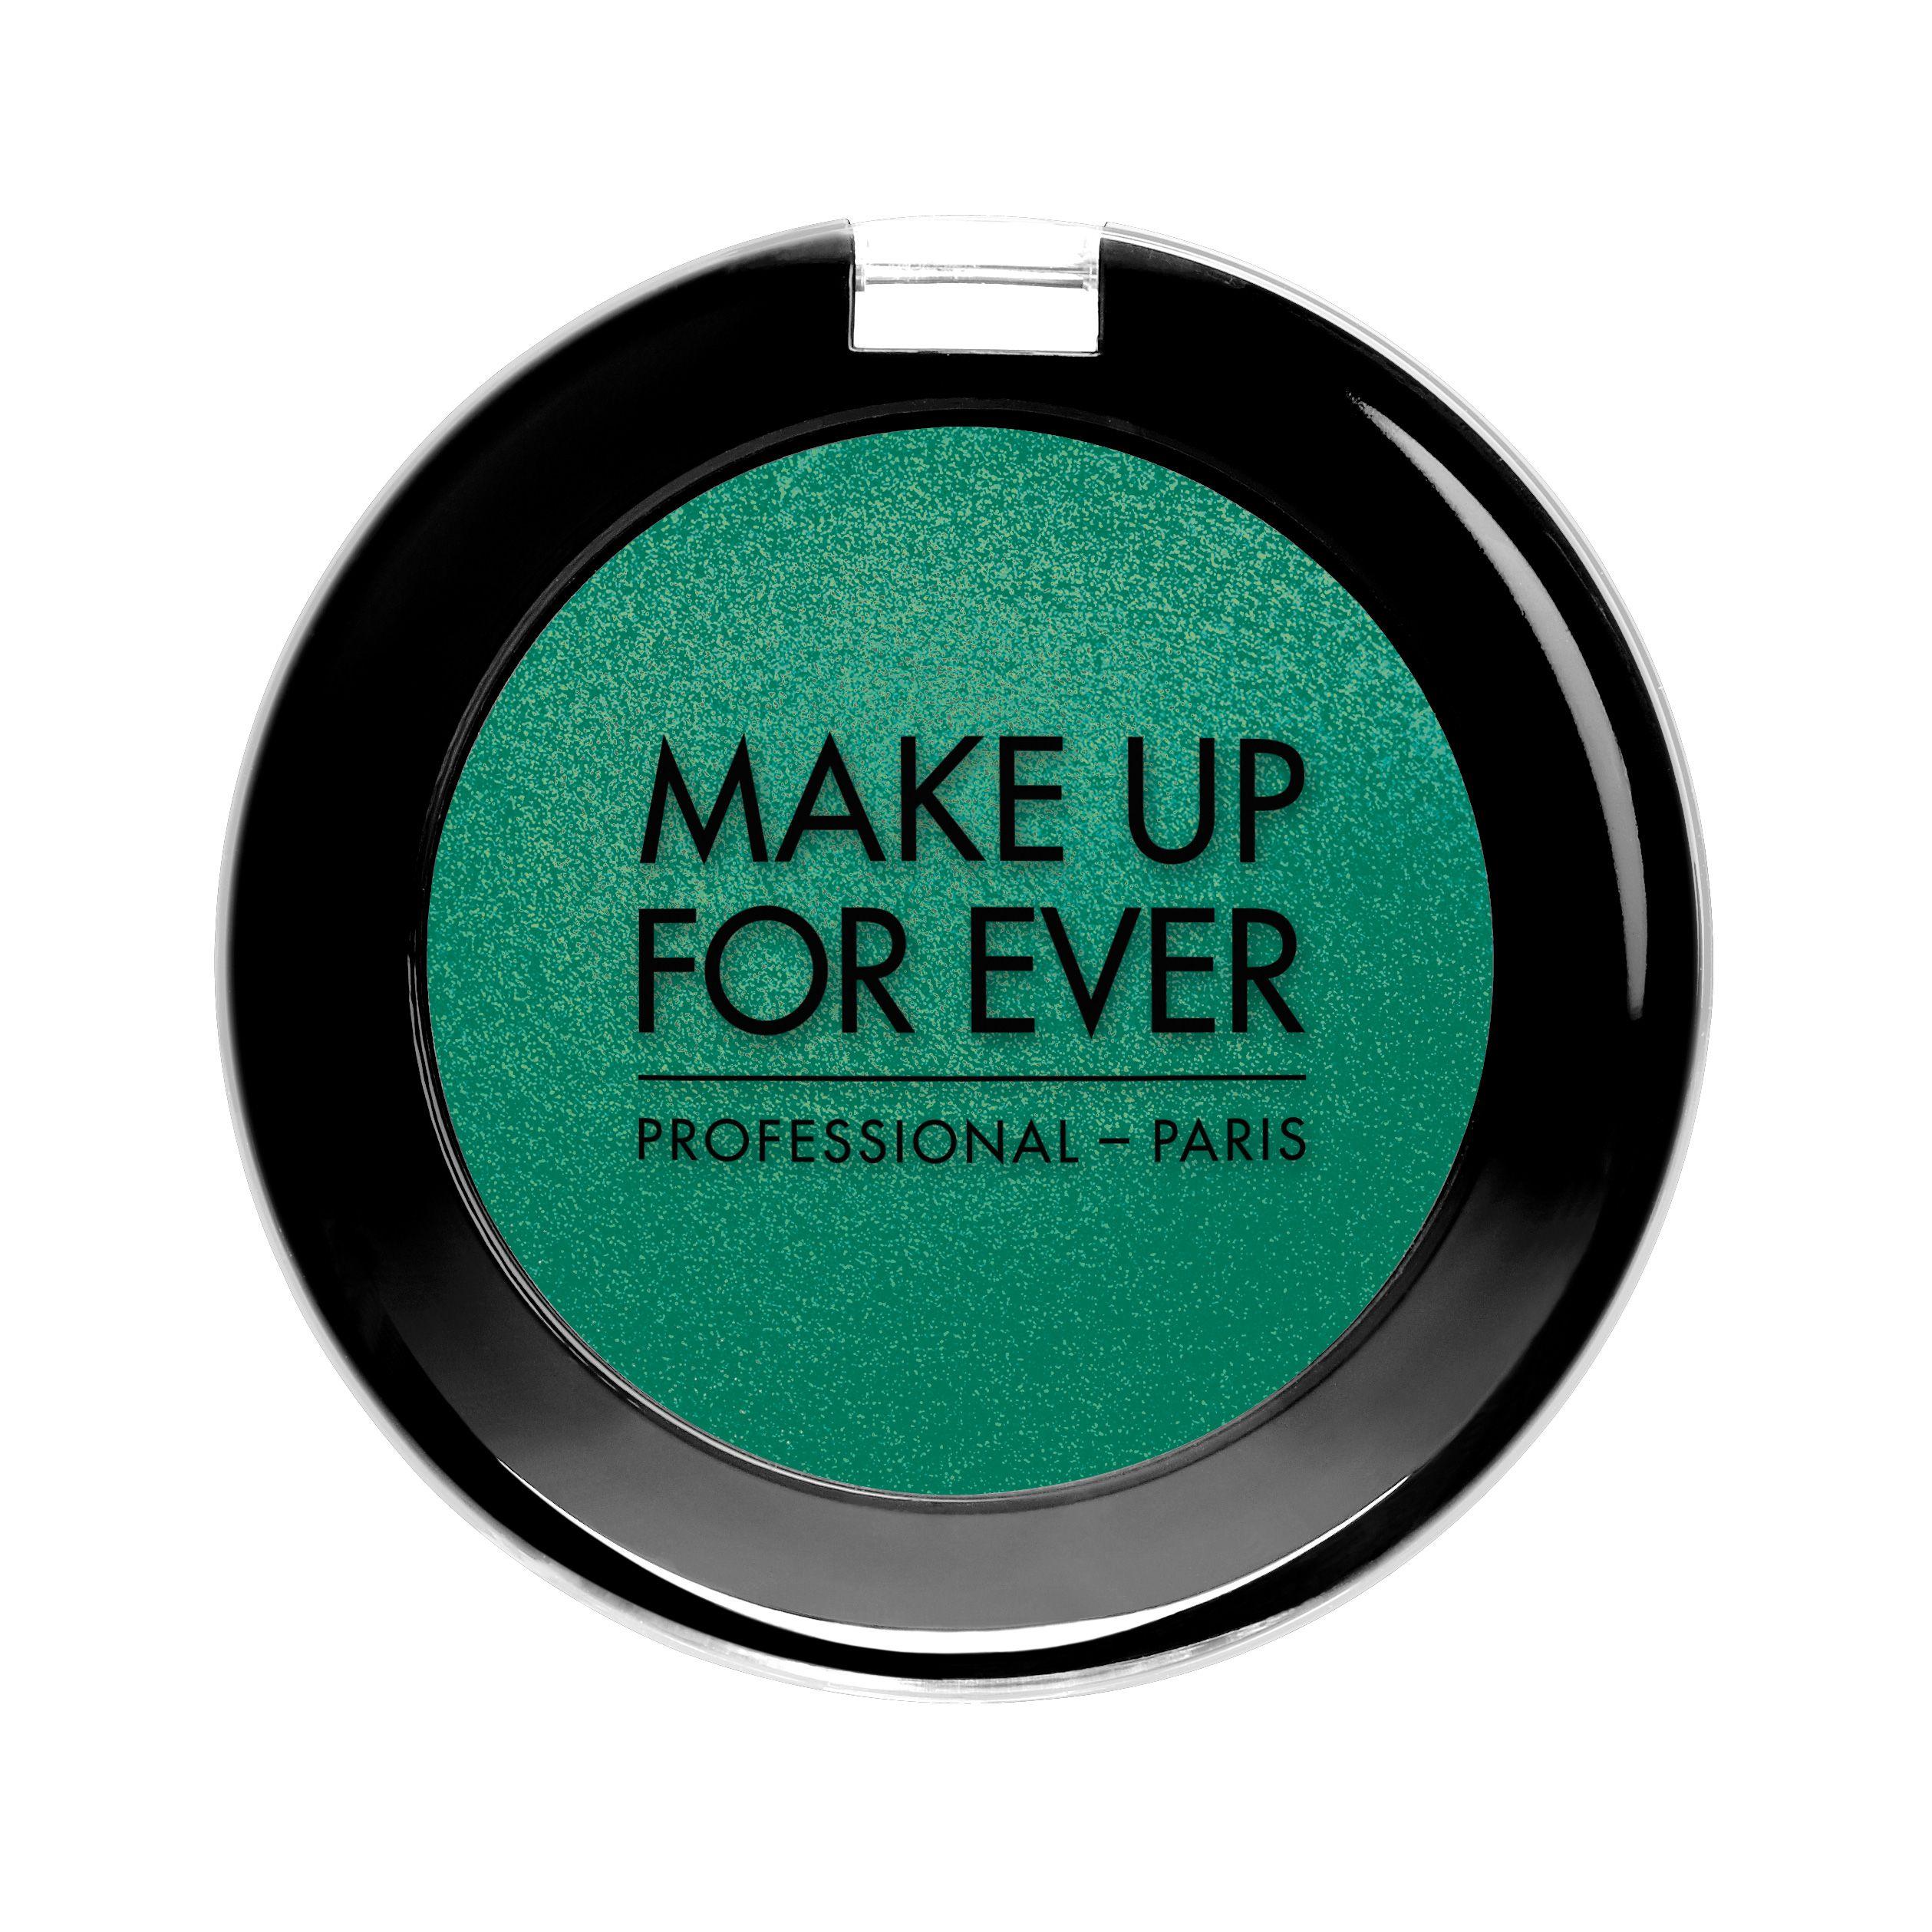 Joe bakers favourite shade me304 emerald artistshadow